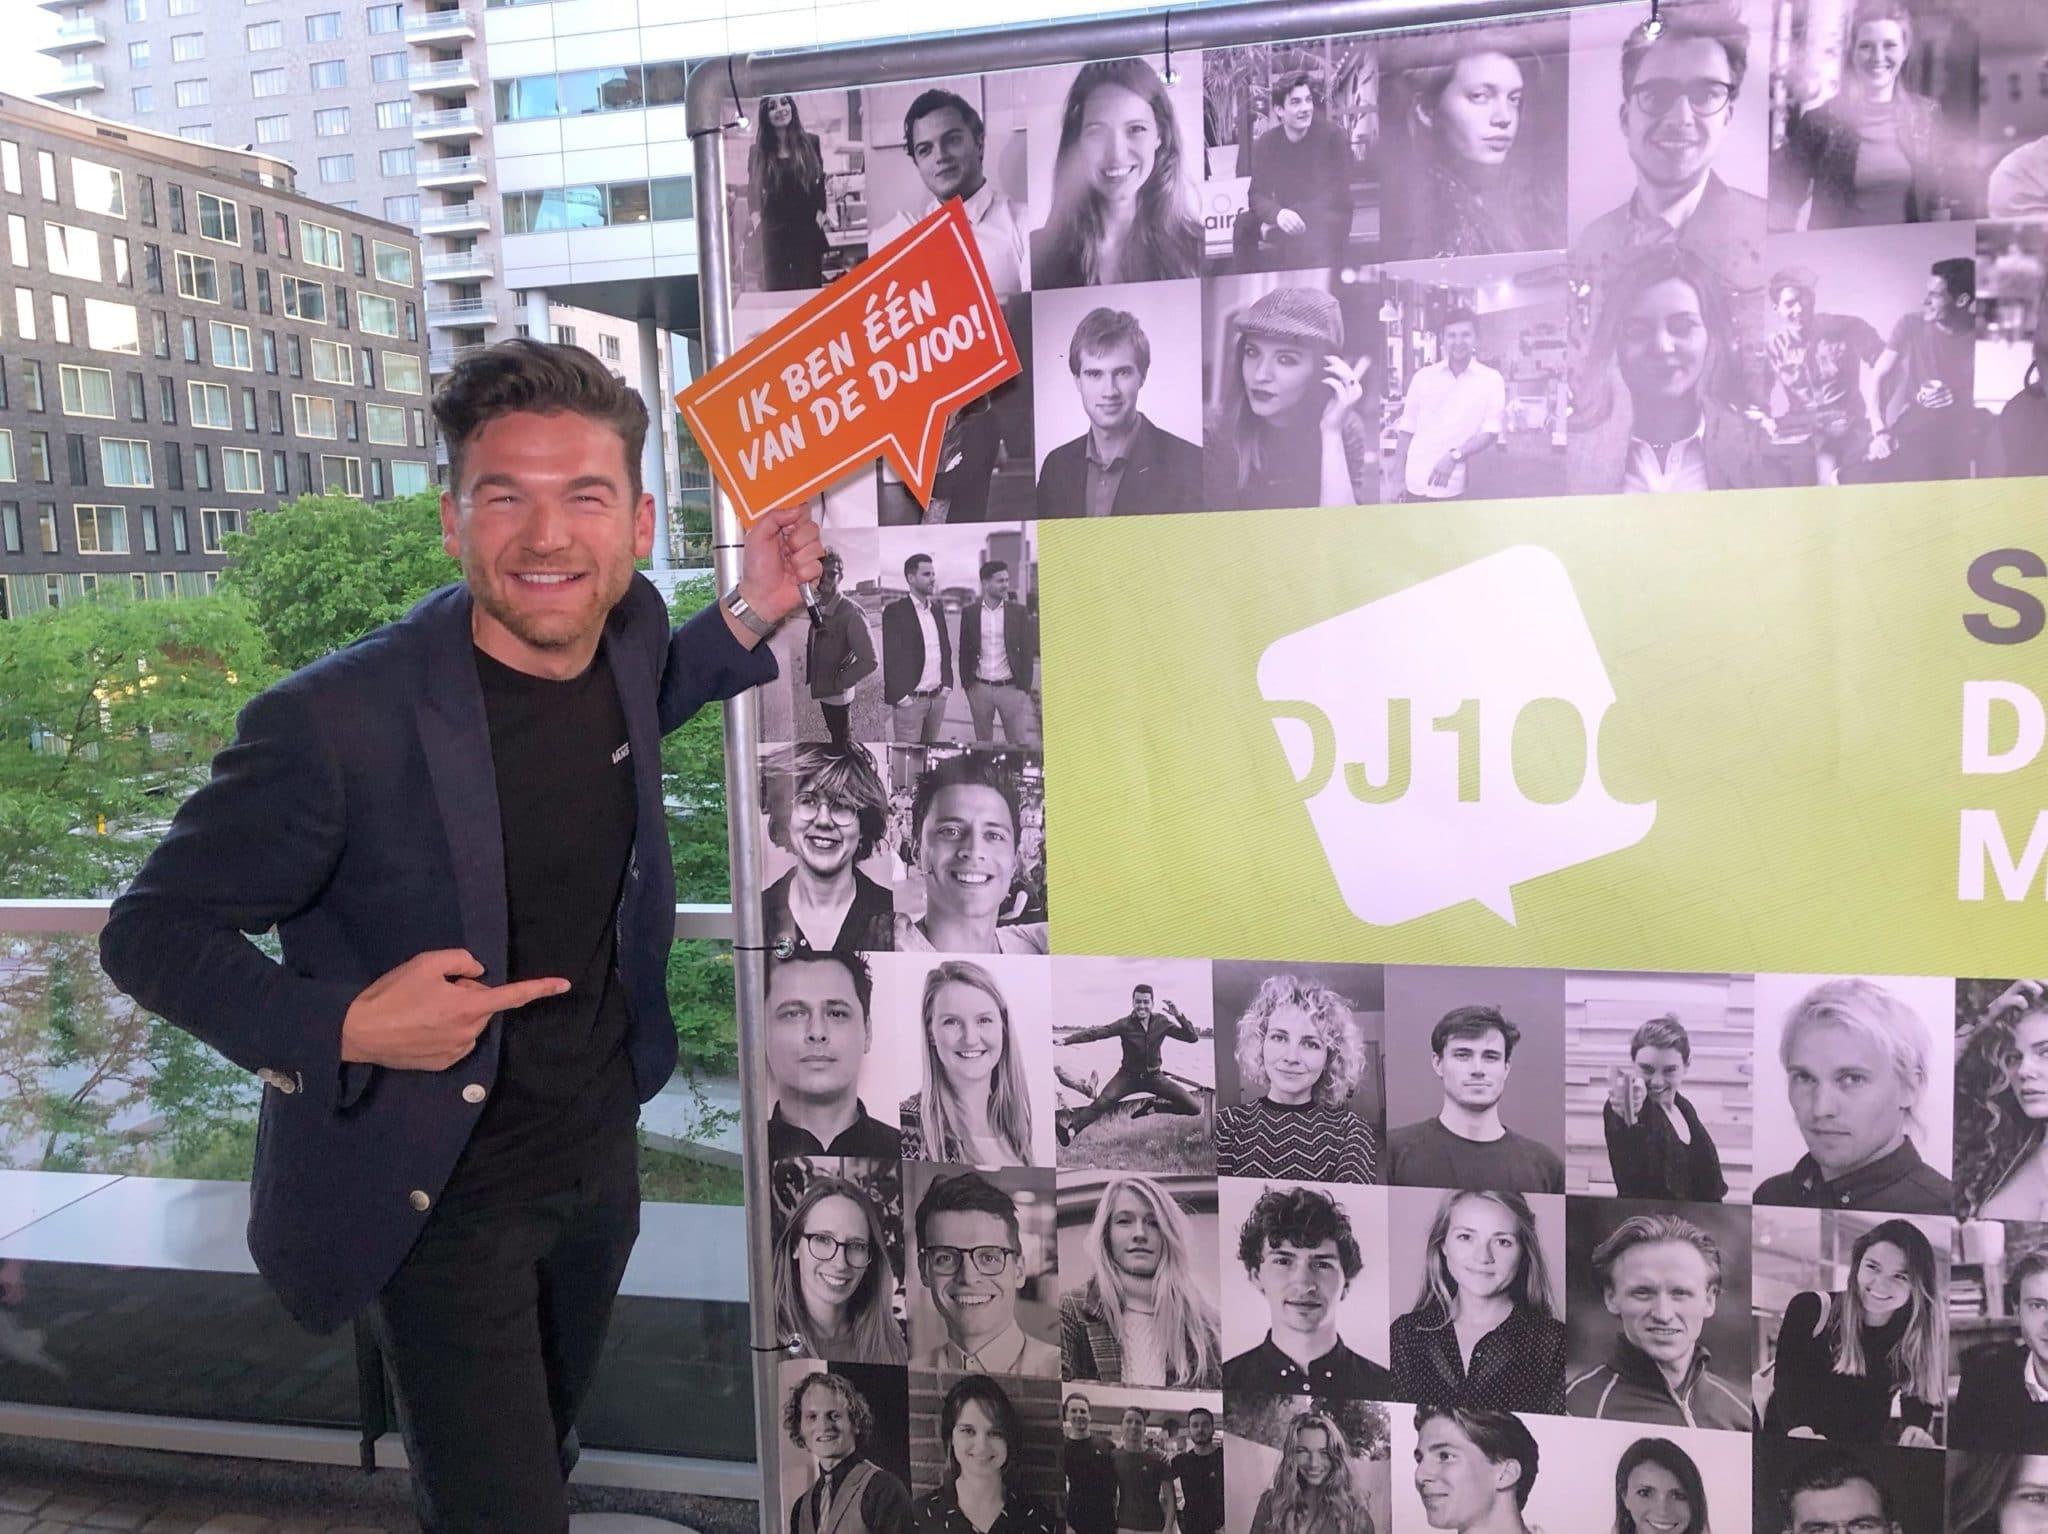 Niek Franken & Kees van Rengs Duurzame koplopers #DJ100